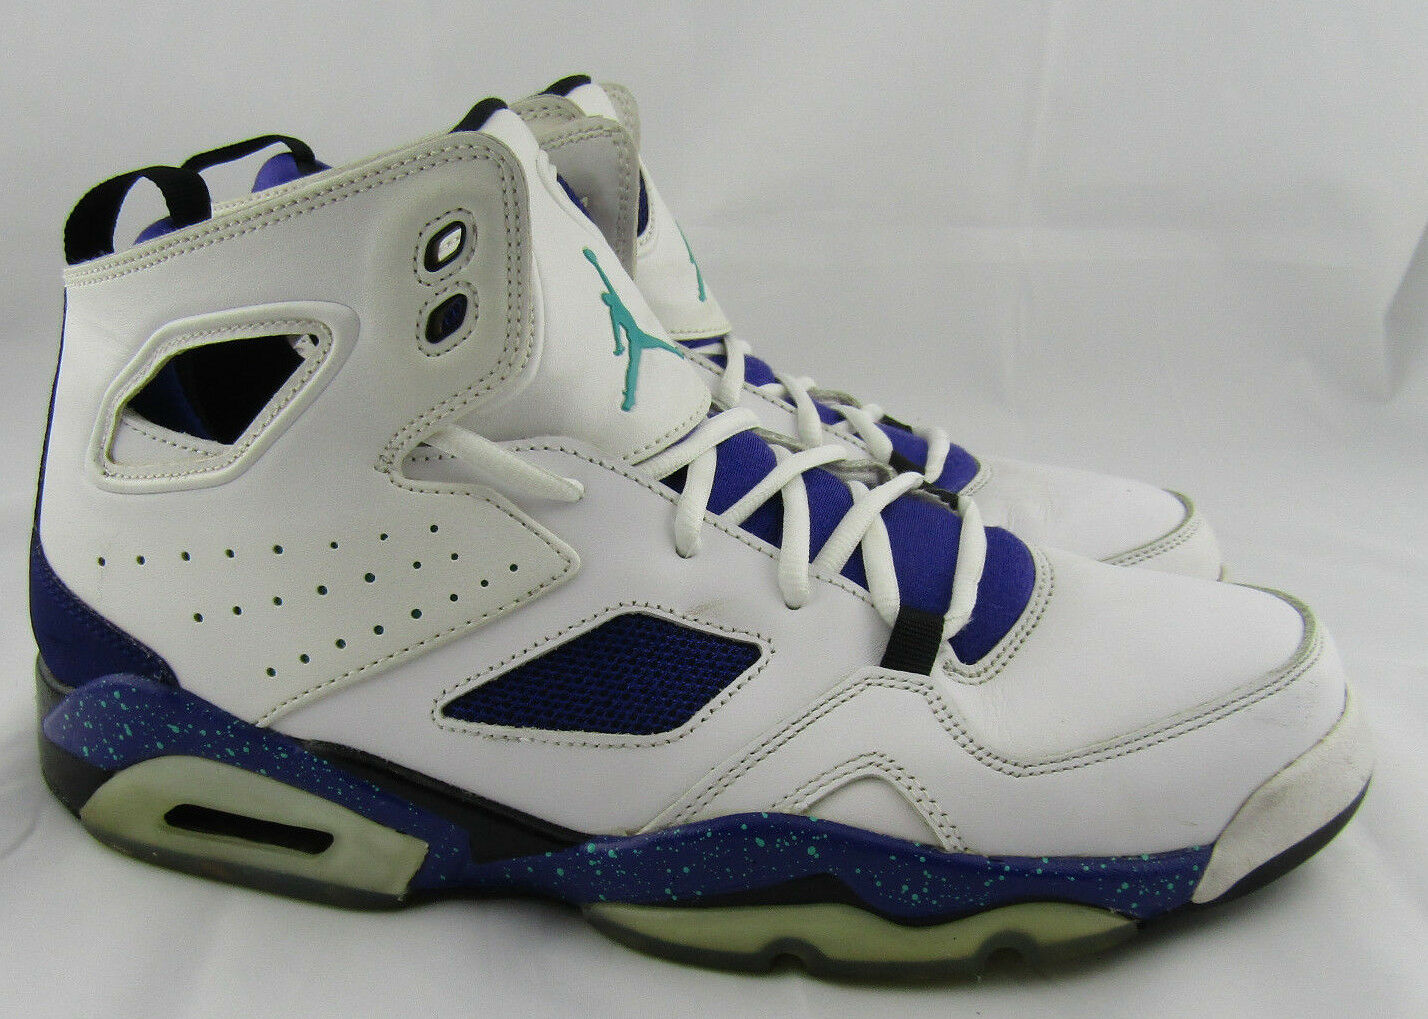 Nike Air Jordan Grape Flight Club 91 Basketball Shoes White 555475-108 Price reduction